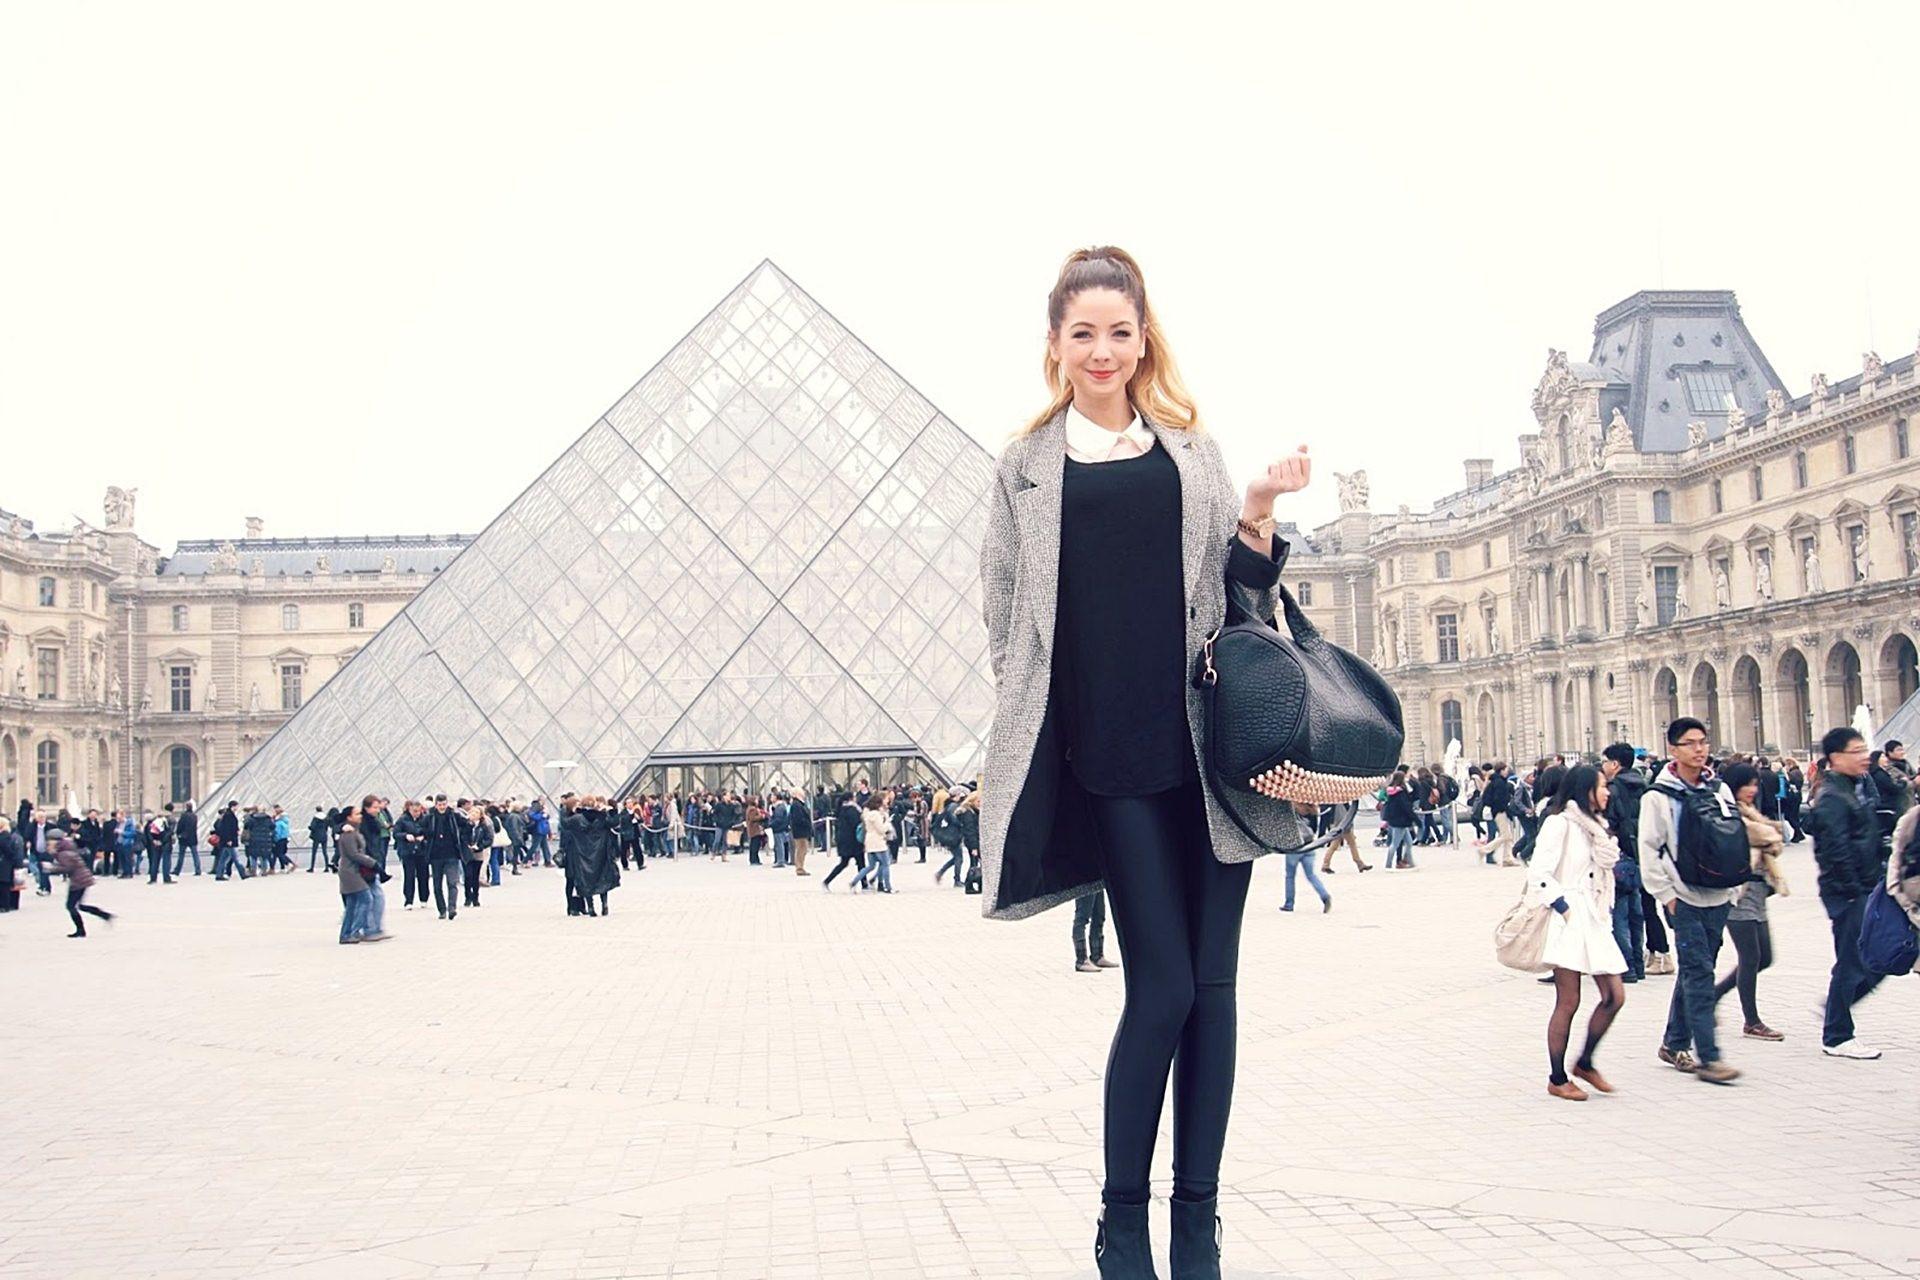 Wallpaper Zoe Sugg en Paris Images